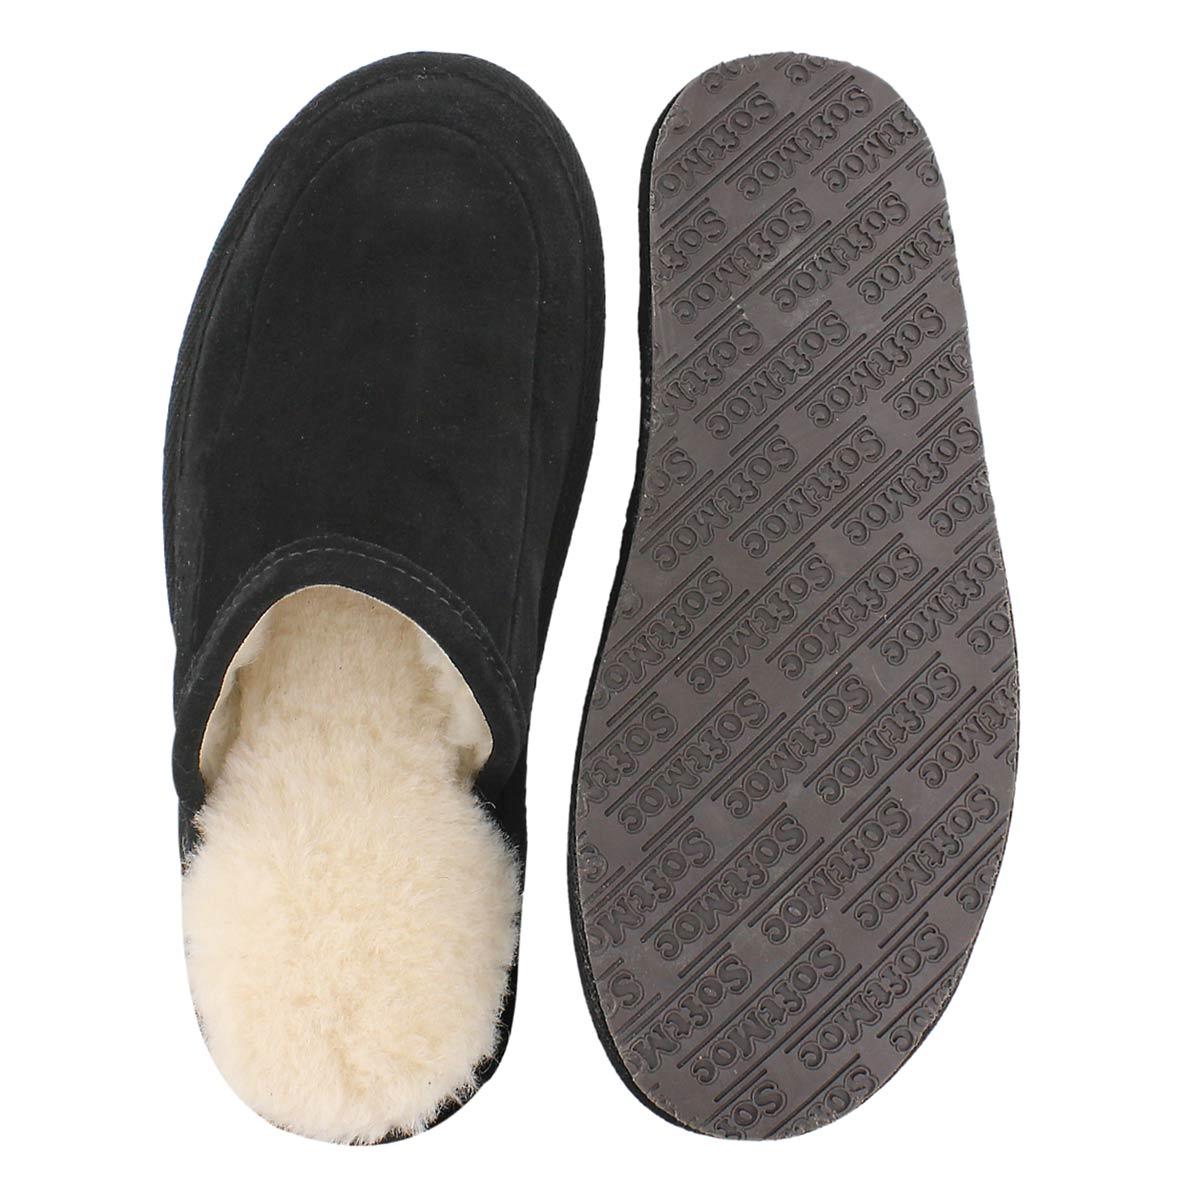 Pantoufles Seth noir, hommmes